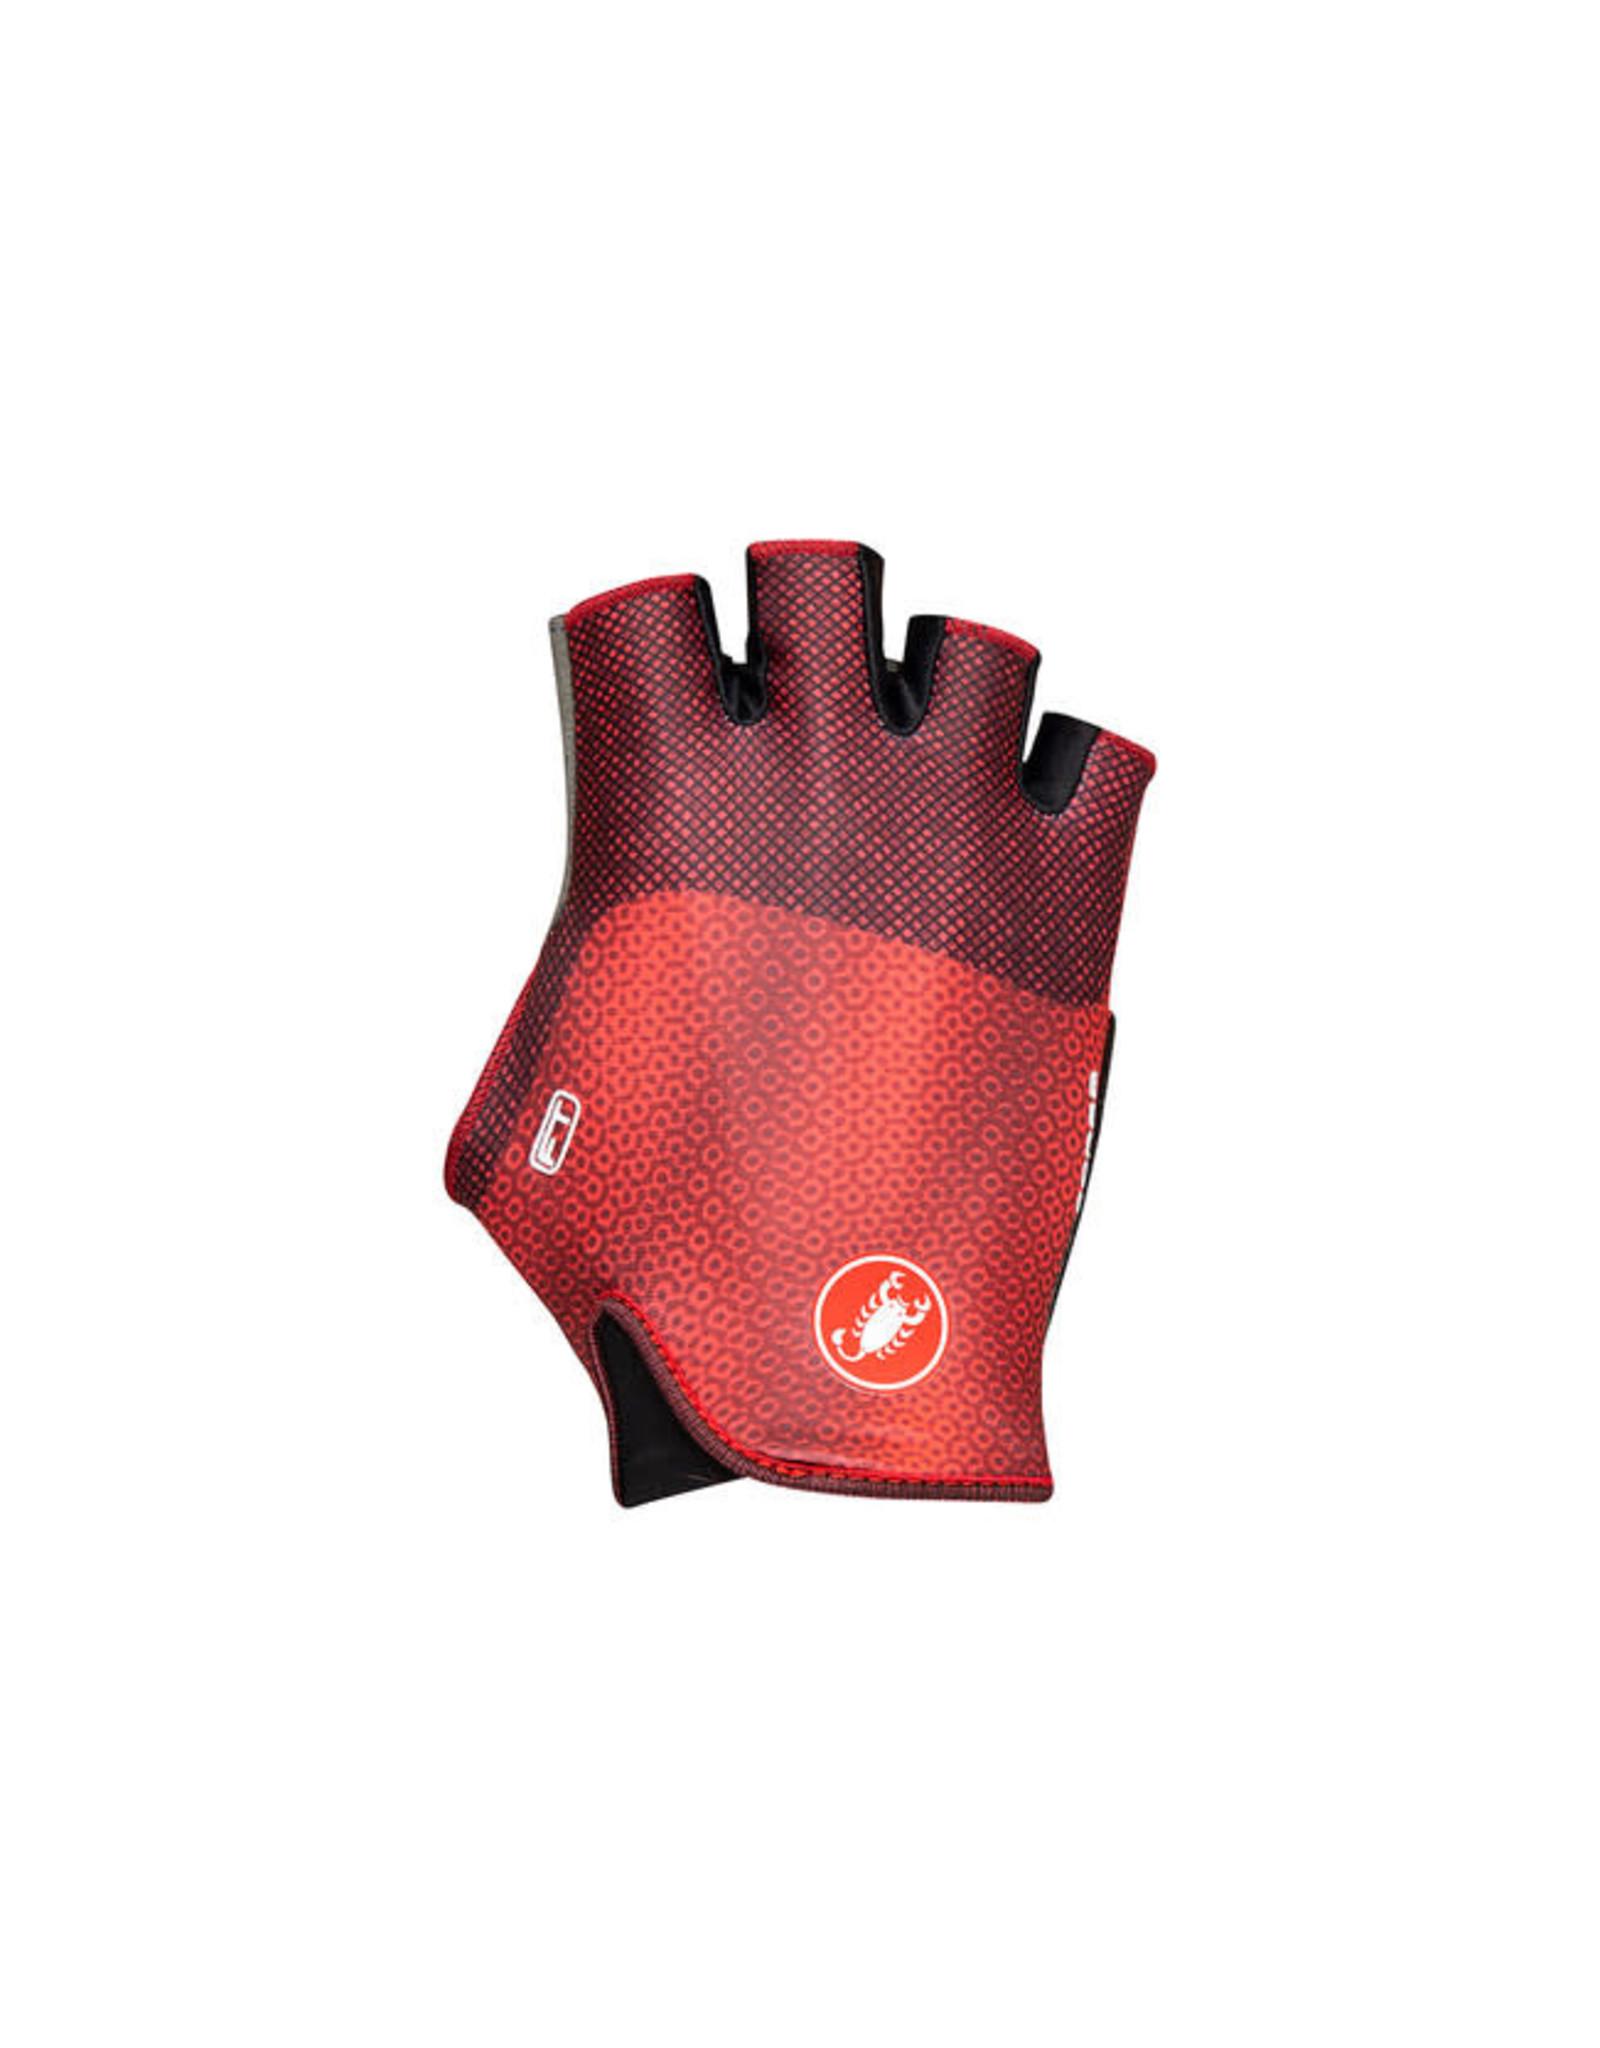 Castelli CASTELLI, Rosso Corsa Pave glove, wmn